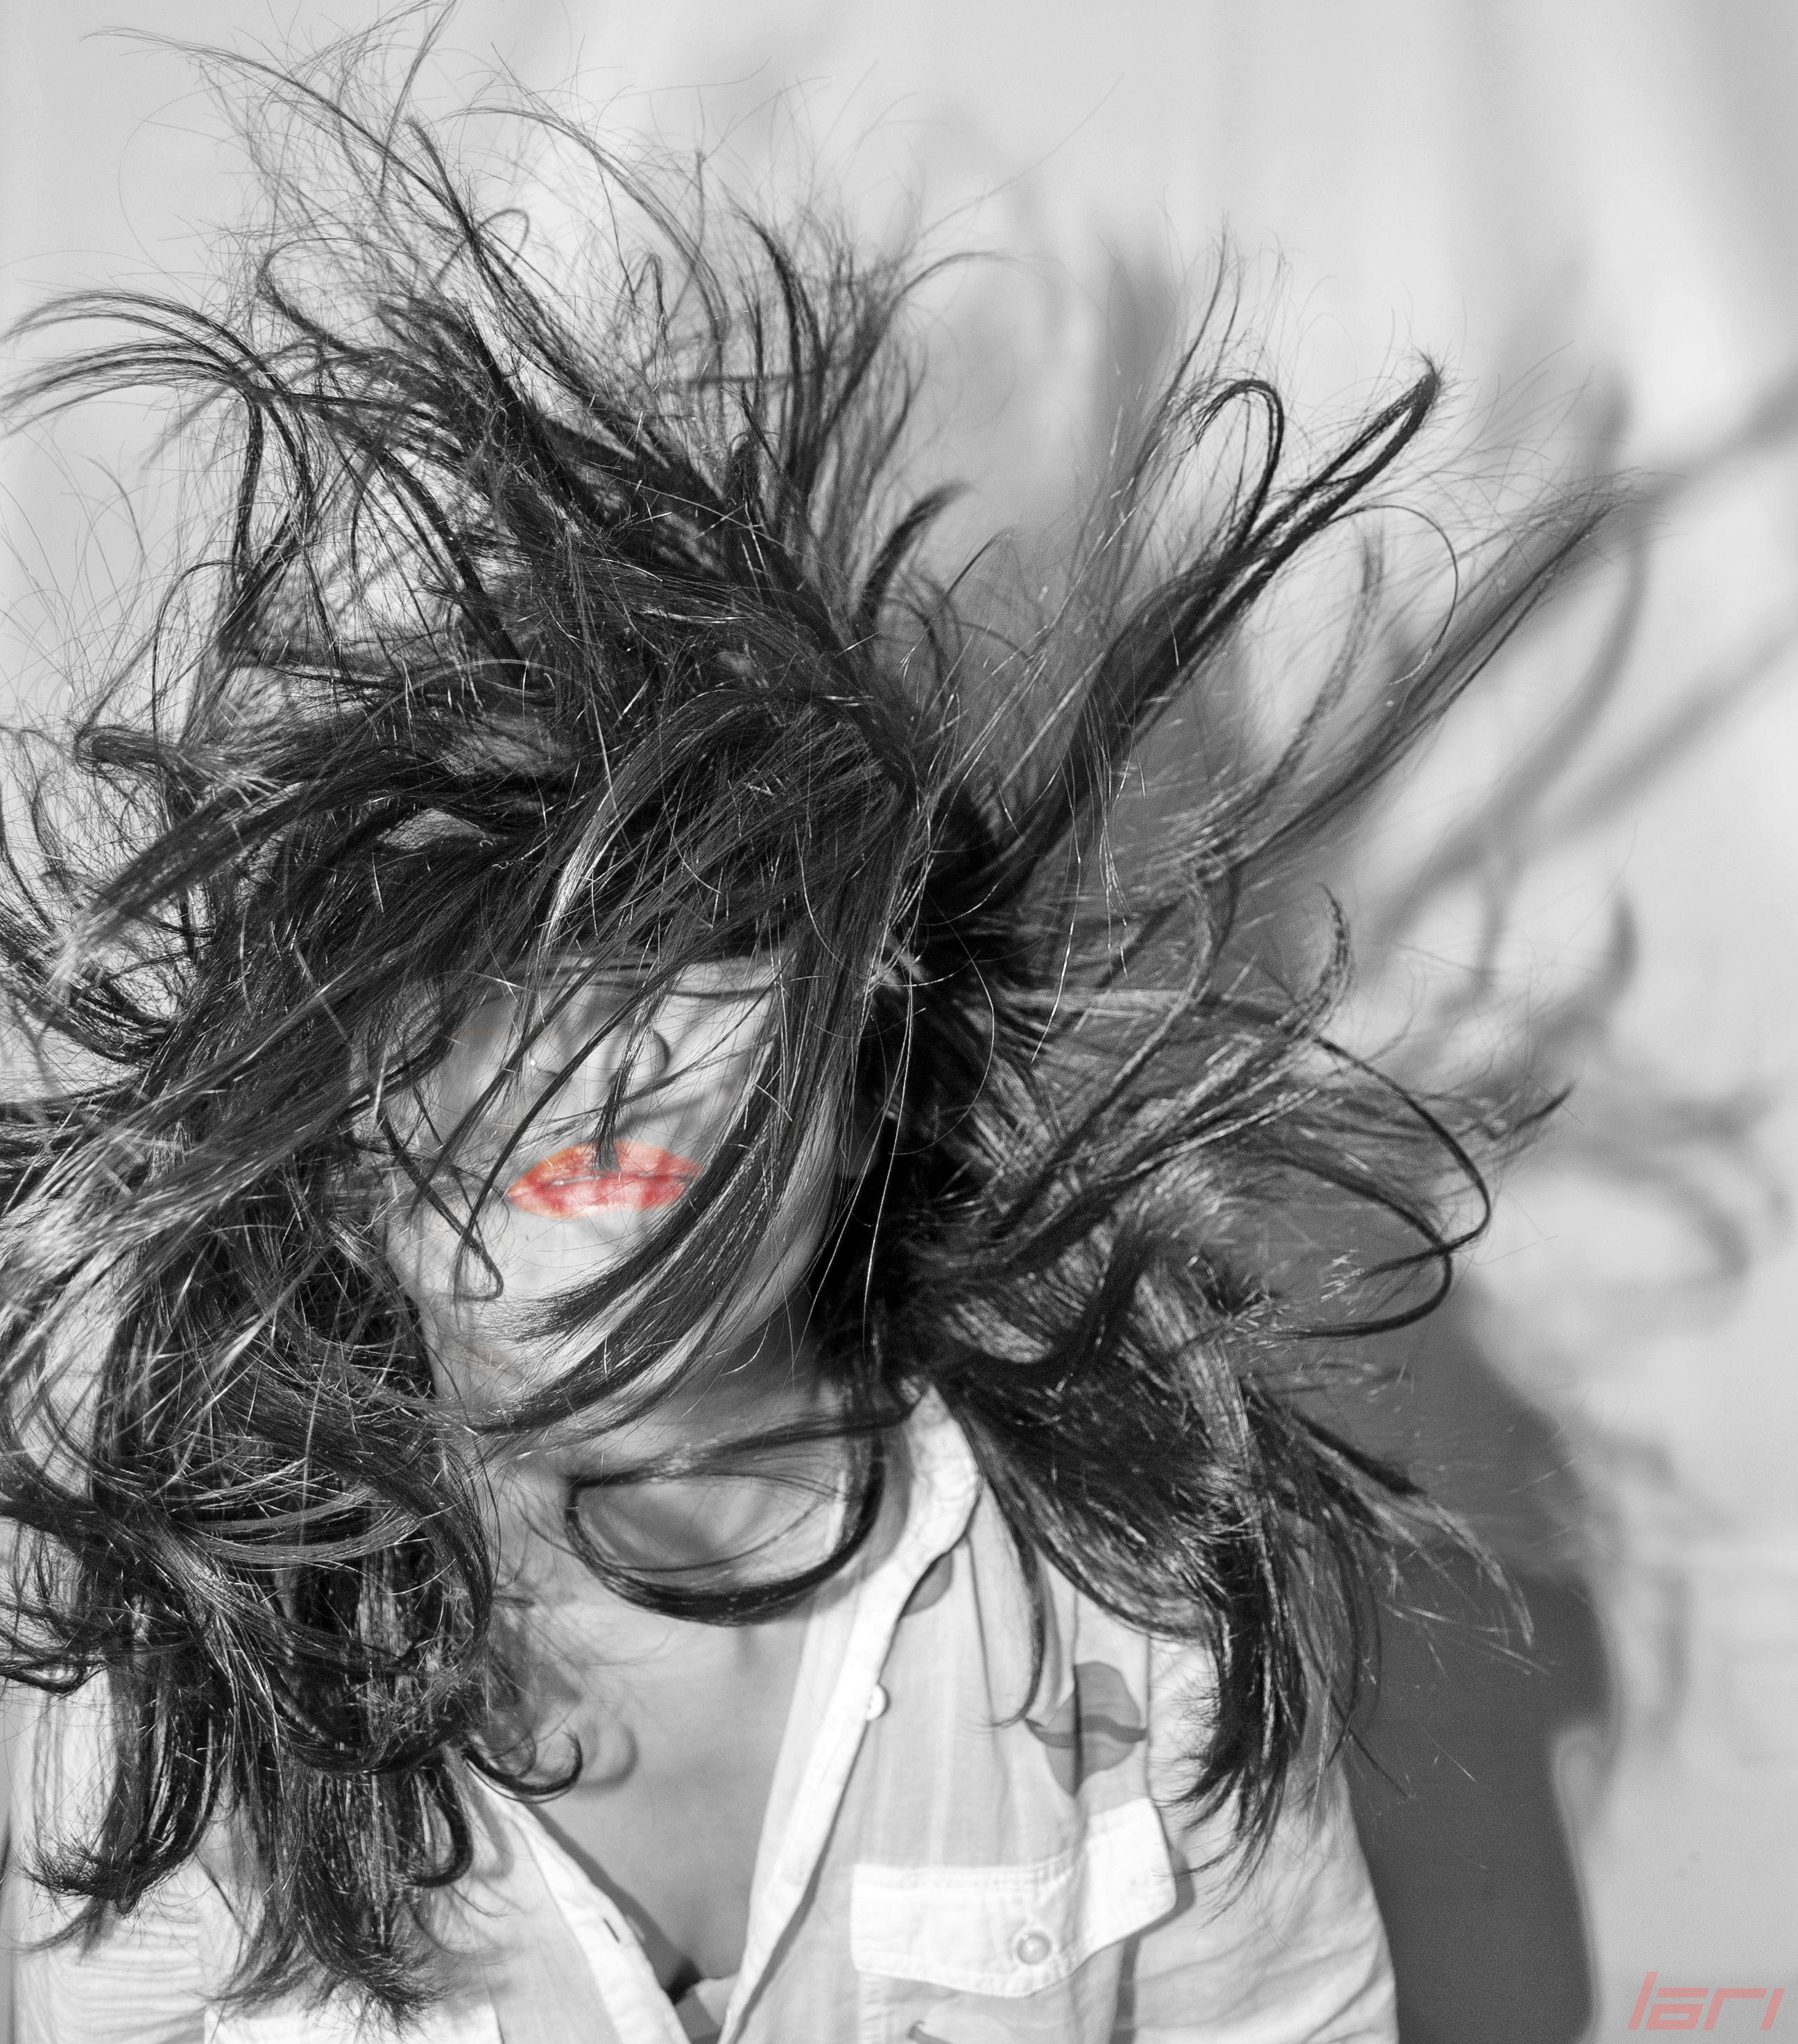 Mi hija Larisa !! #portrait #retrato #photography #blackandwhite#Photography #Fotografia #Photo #Pic #Pix #Picture #Image #Imagem #Portrait #Retrato #Registro #Shot #PPL #People #Nature #Authorial #Autoral #Photographer #Profissional #Professonal #Colored #Colorido #Cor #Color #BW #PB #Black #White #Preto #Branco #Art #Arte #Nice #Cool #Beleza #Lindo #Paisagem #Landscape #Natureza #Memory #Fotografar #Memoria #Clic #Ensaio #Essay